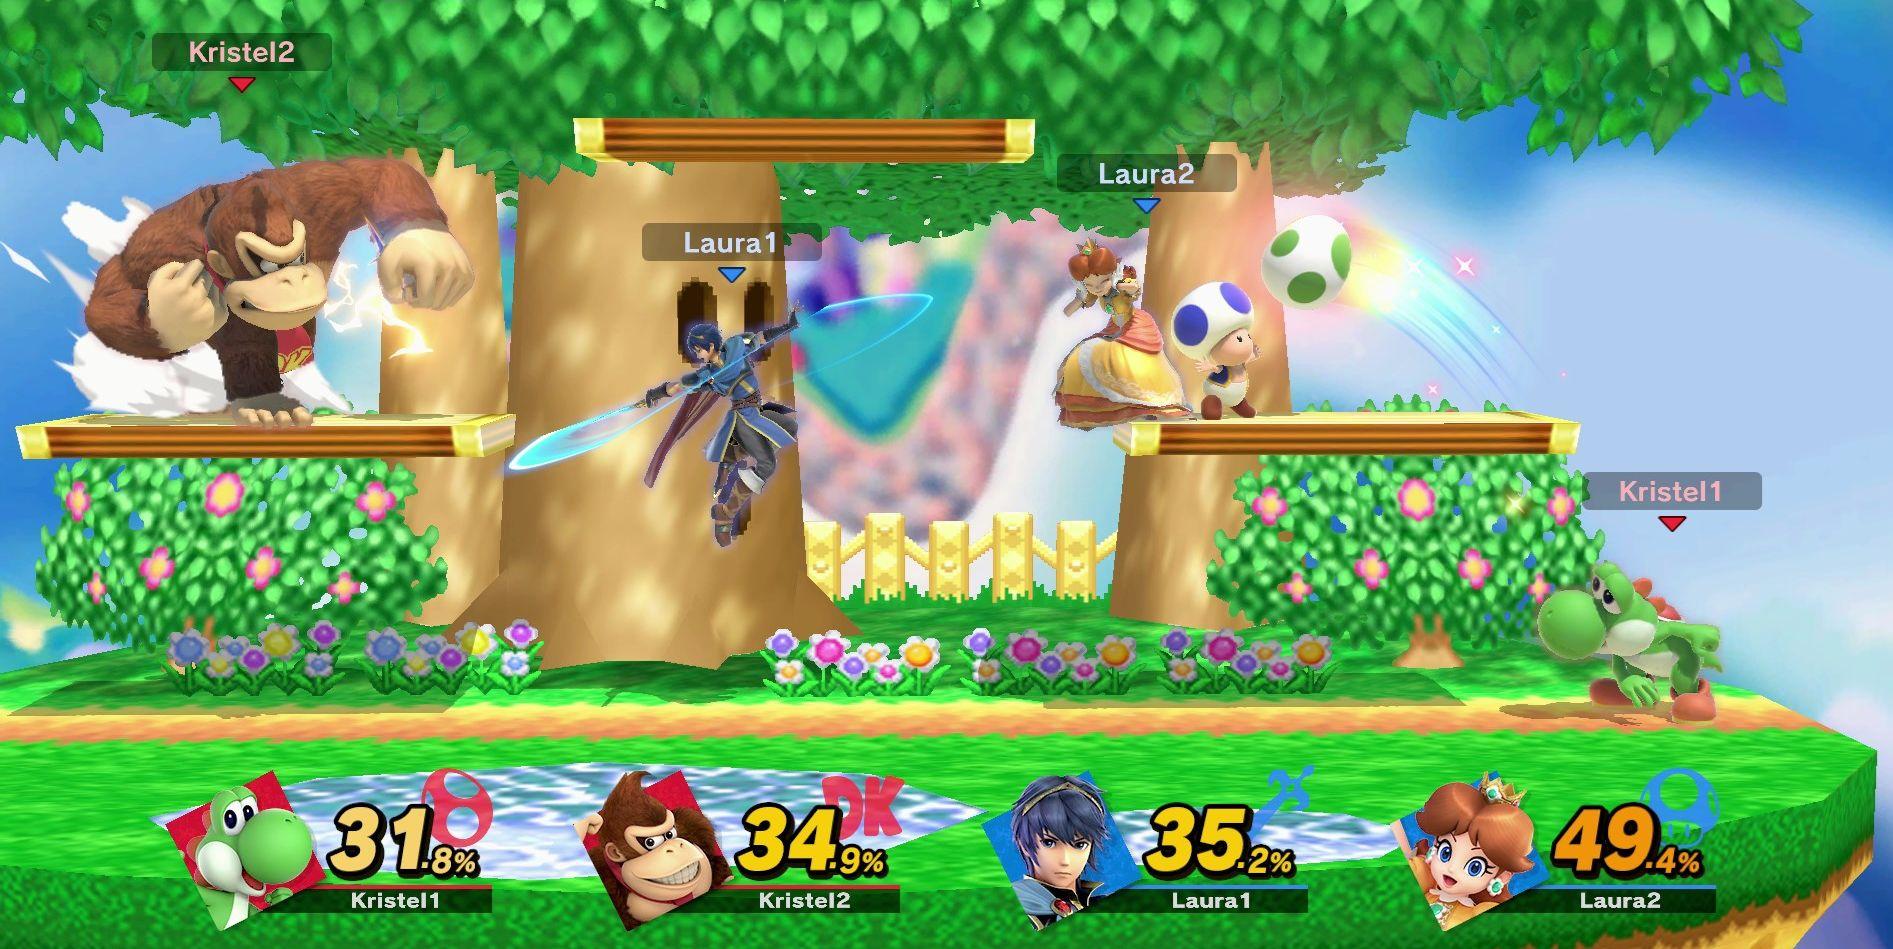 Promotion nintendo switch jeux neo geo, avis nintendo switch vs ps4